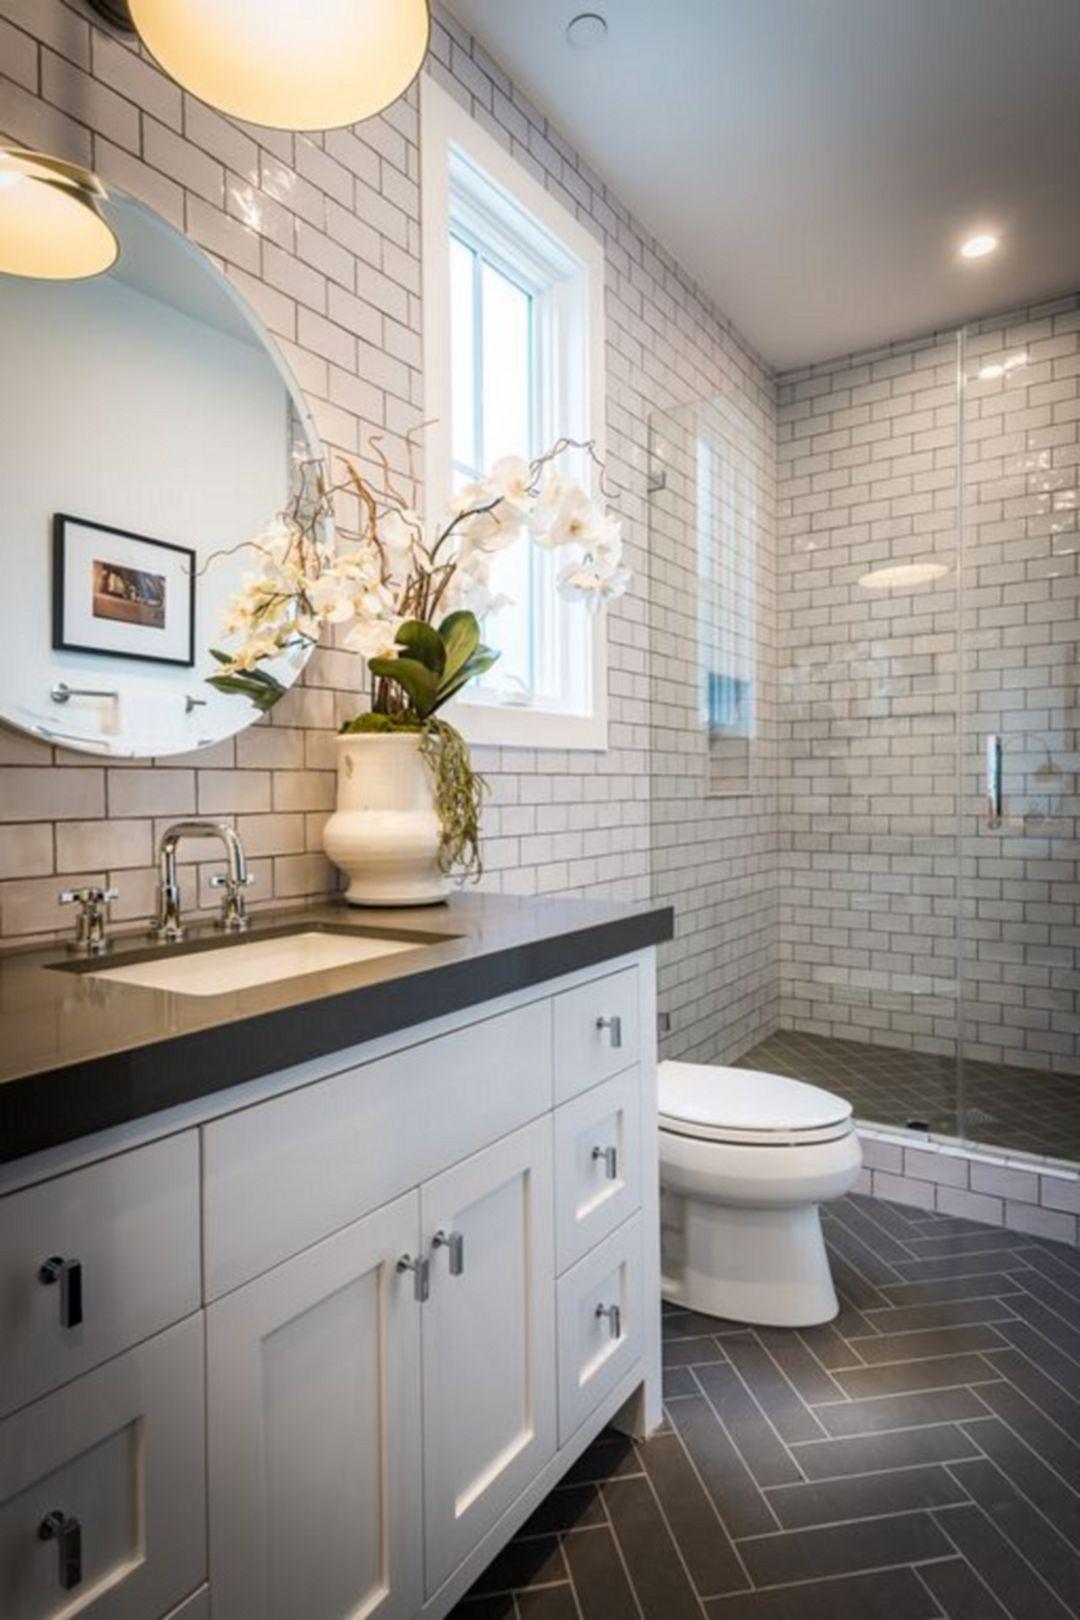 25 unique bathroom tile ideas for your beautiful home on cool small bathroom design ideas id=38889